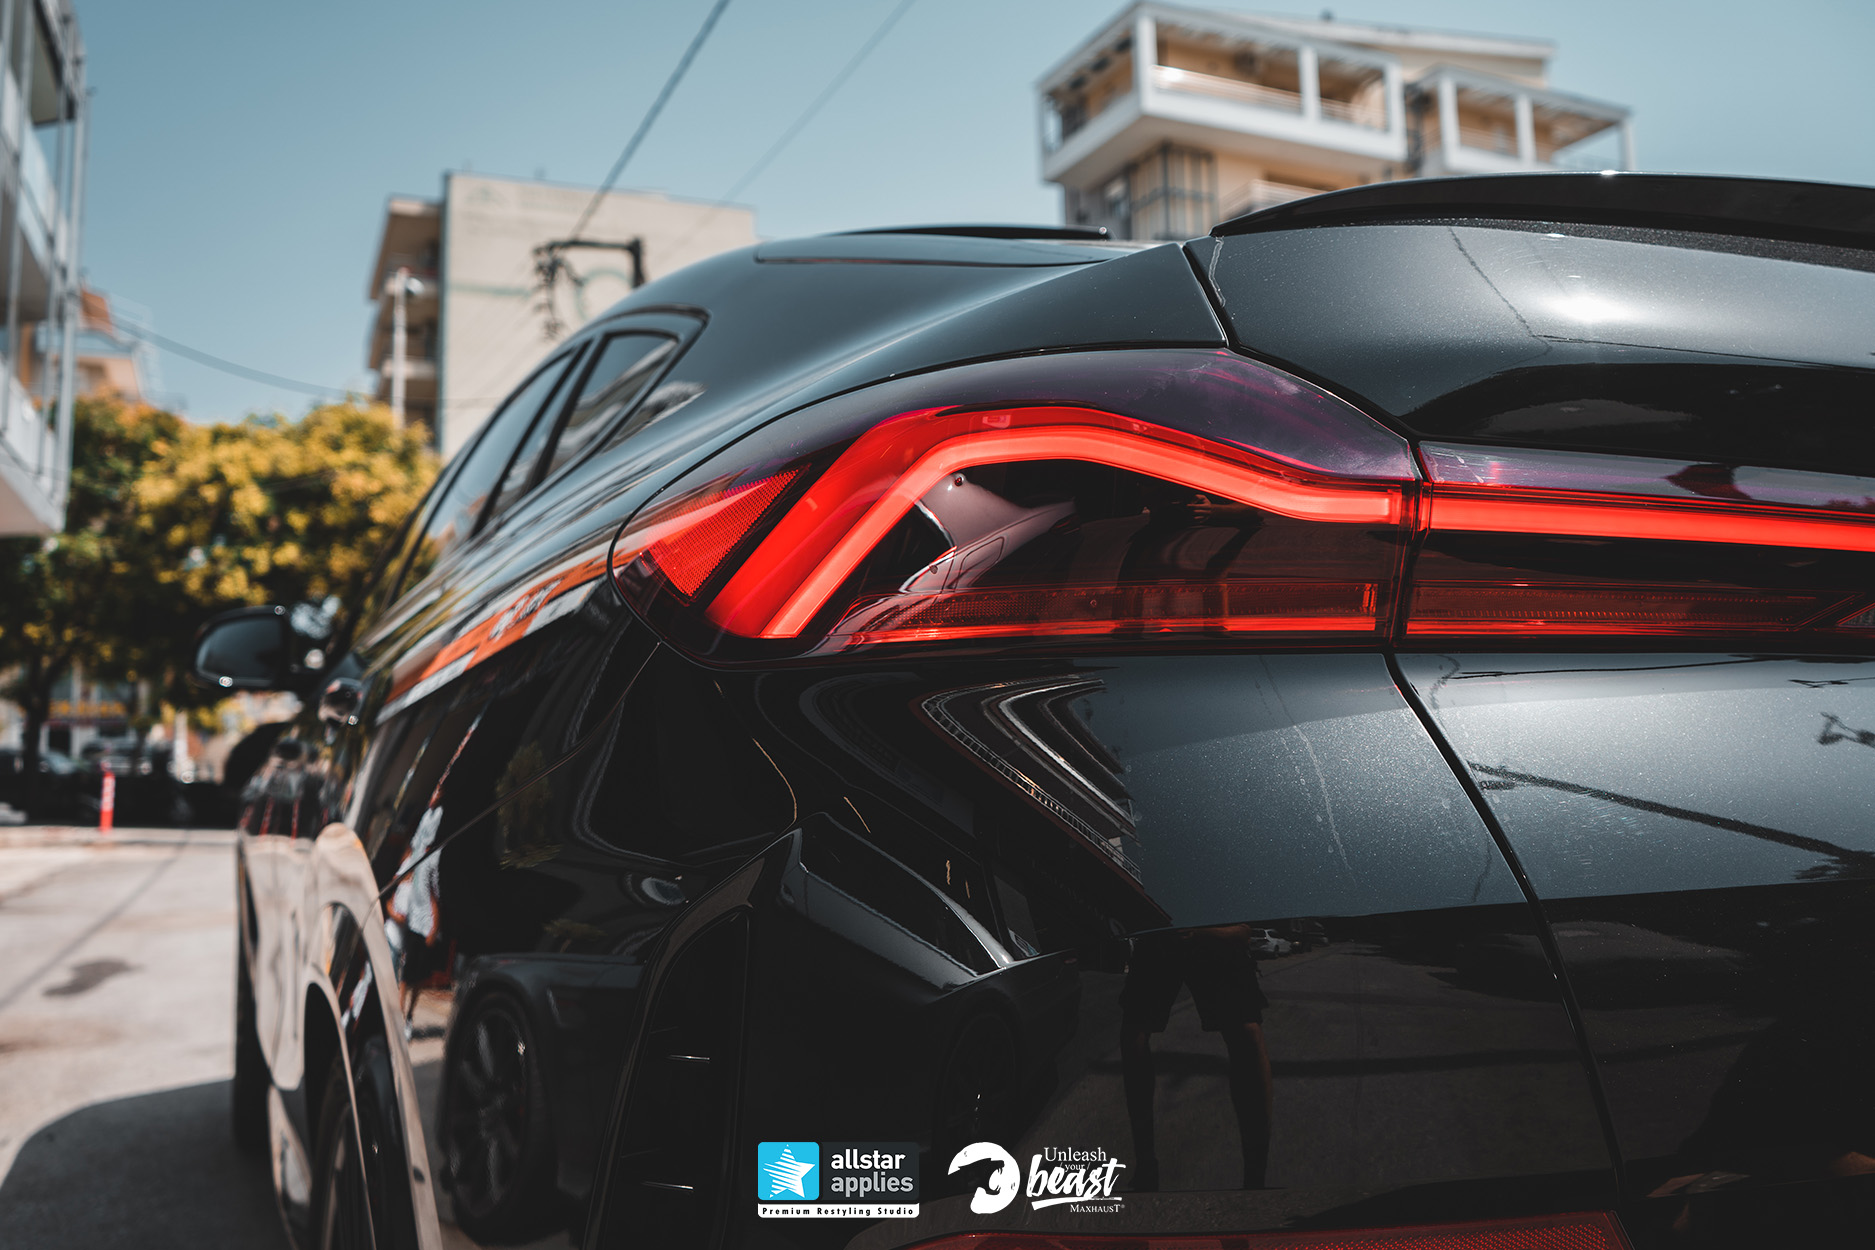 MAXHAUST BMW X6 M50D 2021 10